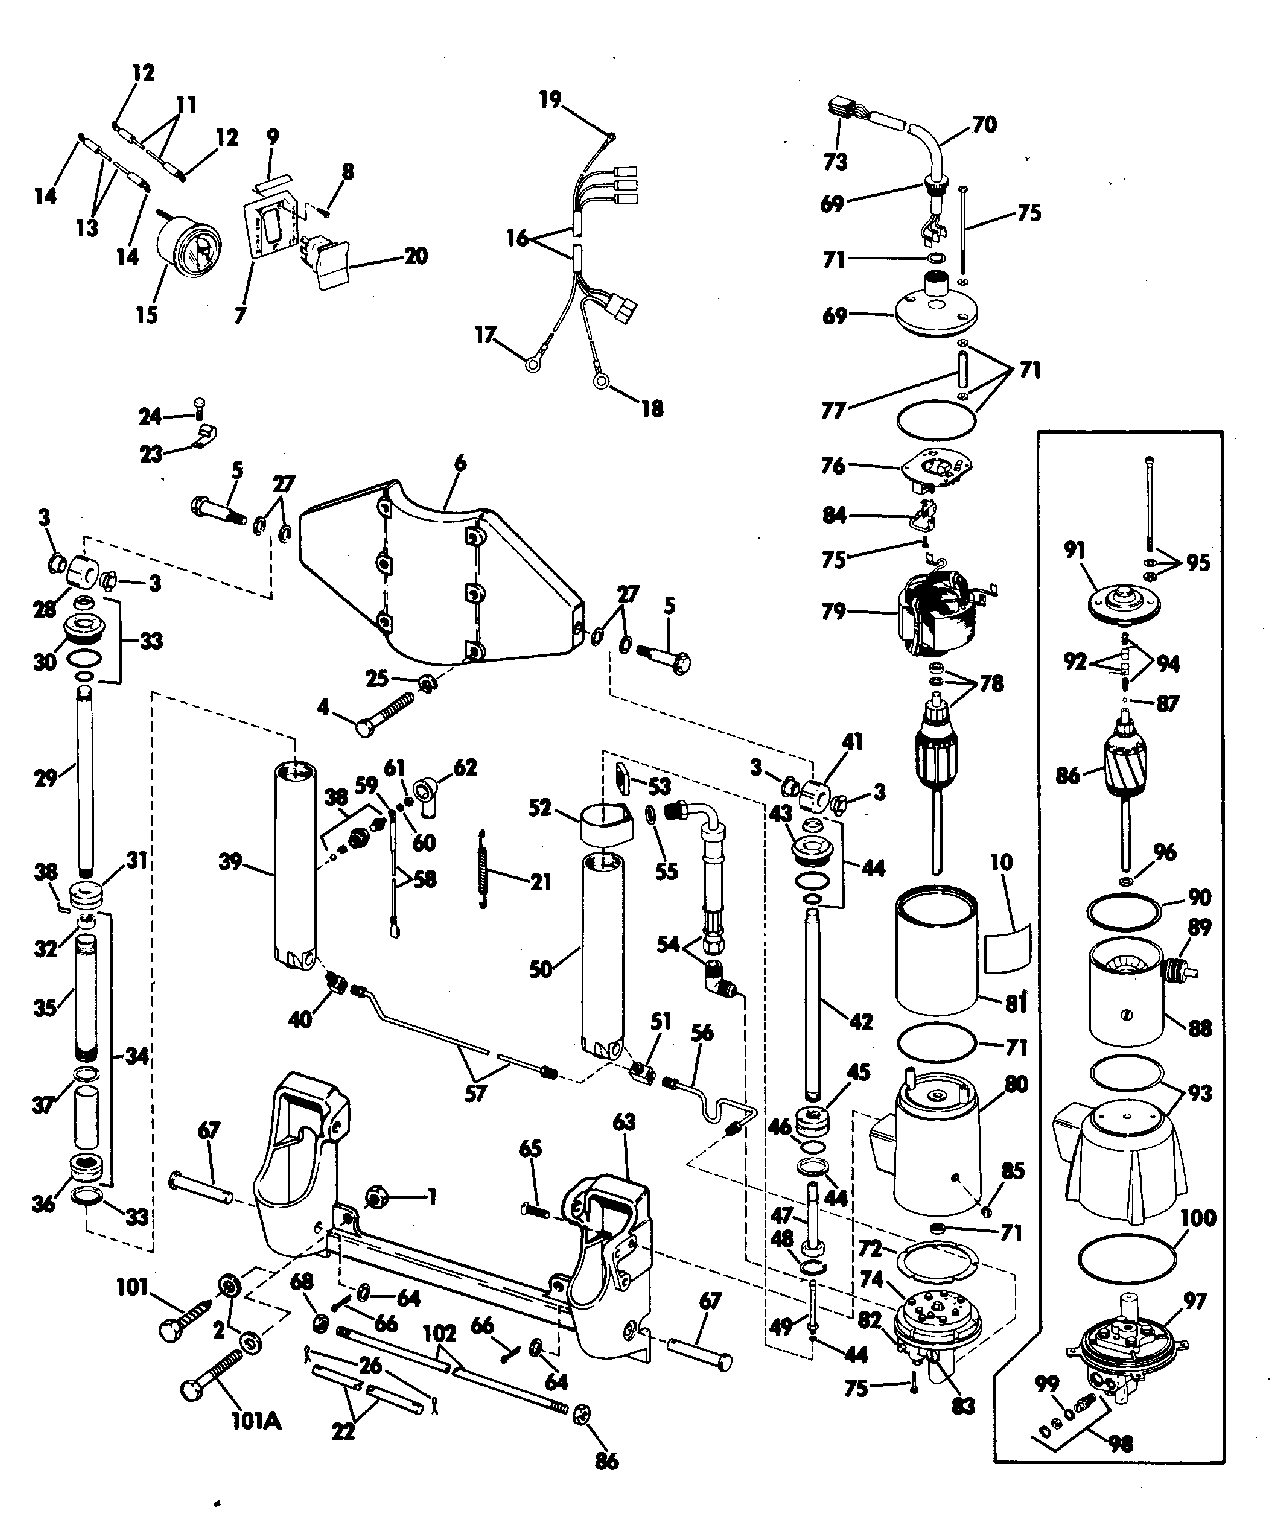 1988 yamaha banshee wiring diagram 1988 suzuki lt250